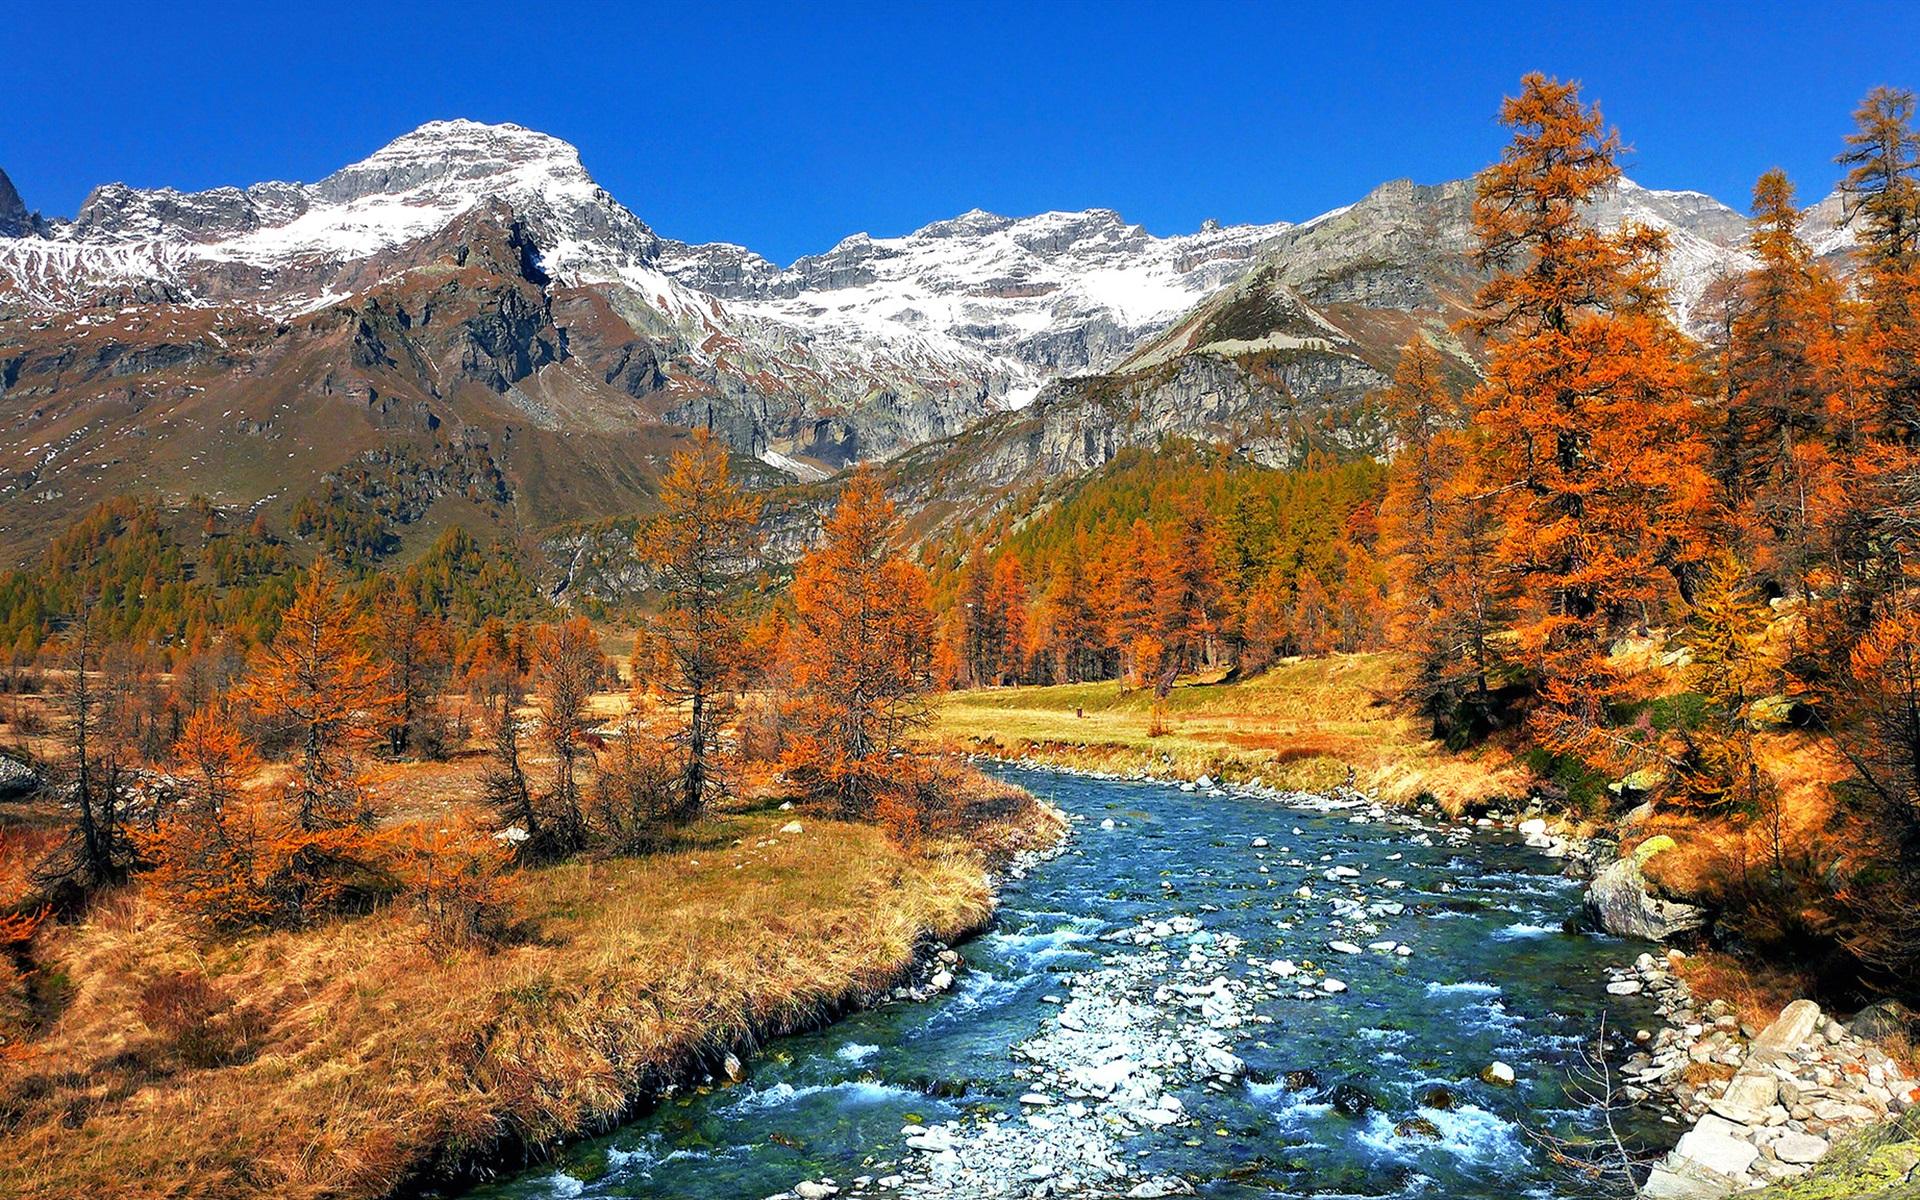 Fondo De Pantalla Paisaje Montañas Nevada: Fondos De Pantalla Italia Naturaleza Paisaje, árboles